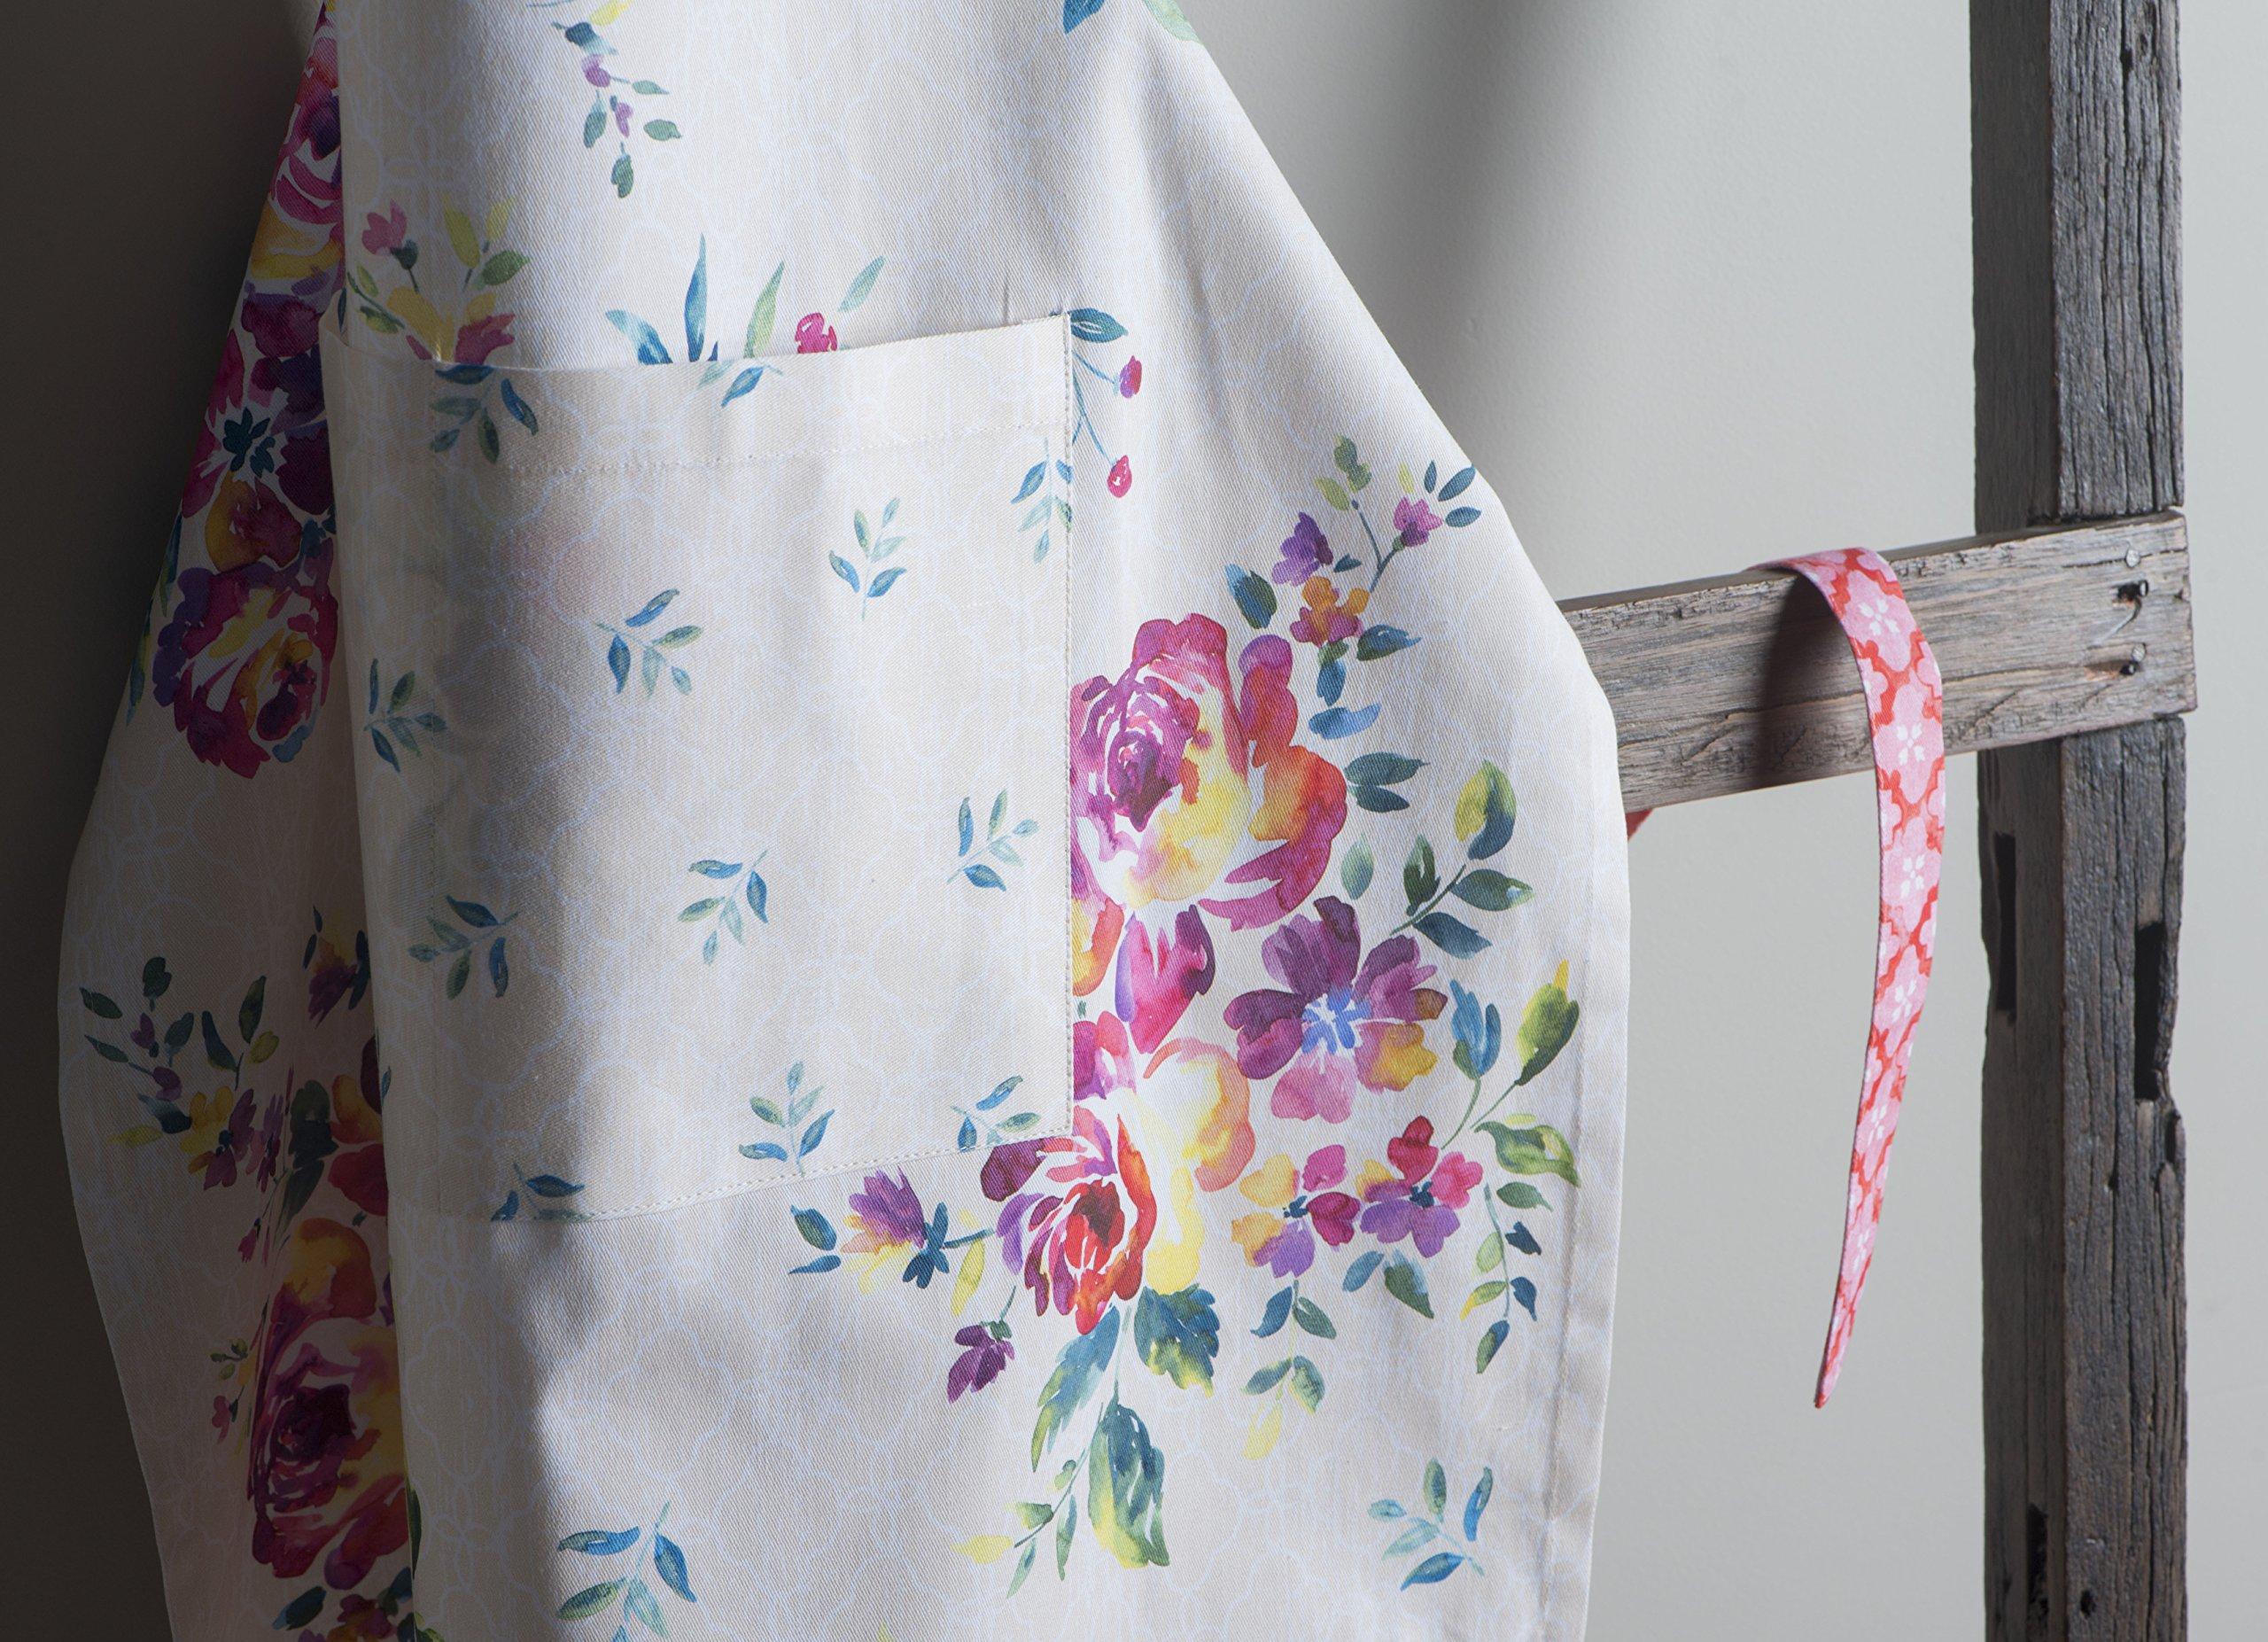 Maison d' Hermine Rose Garden 100% Cotton Apron with an adjustable neck & Visible center pocket 27.50 Inch by 31.50 Inch by Maison d' Hermine (Image #3)